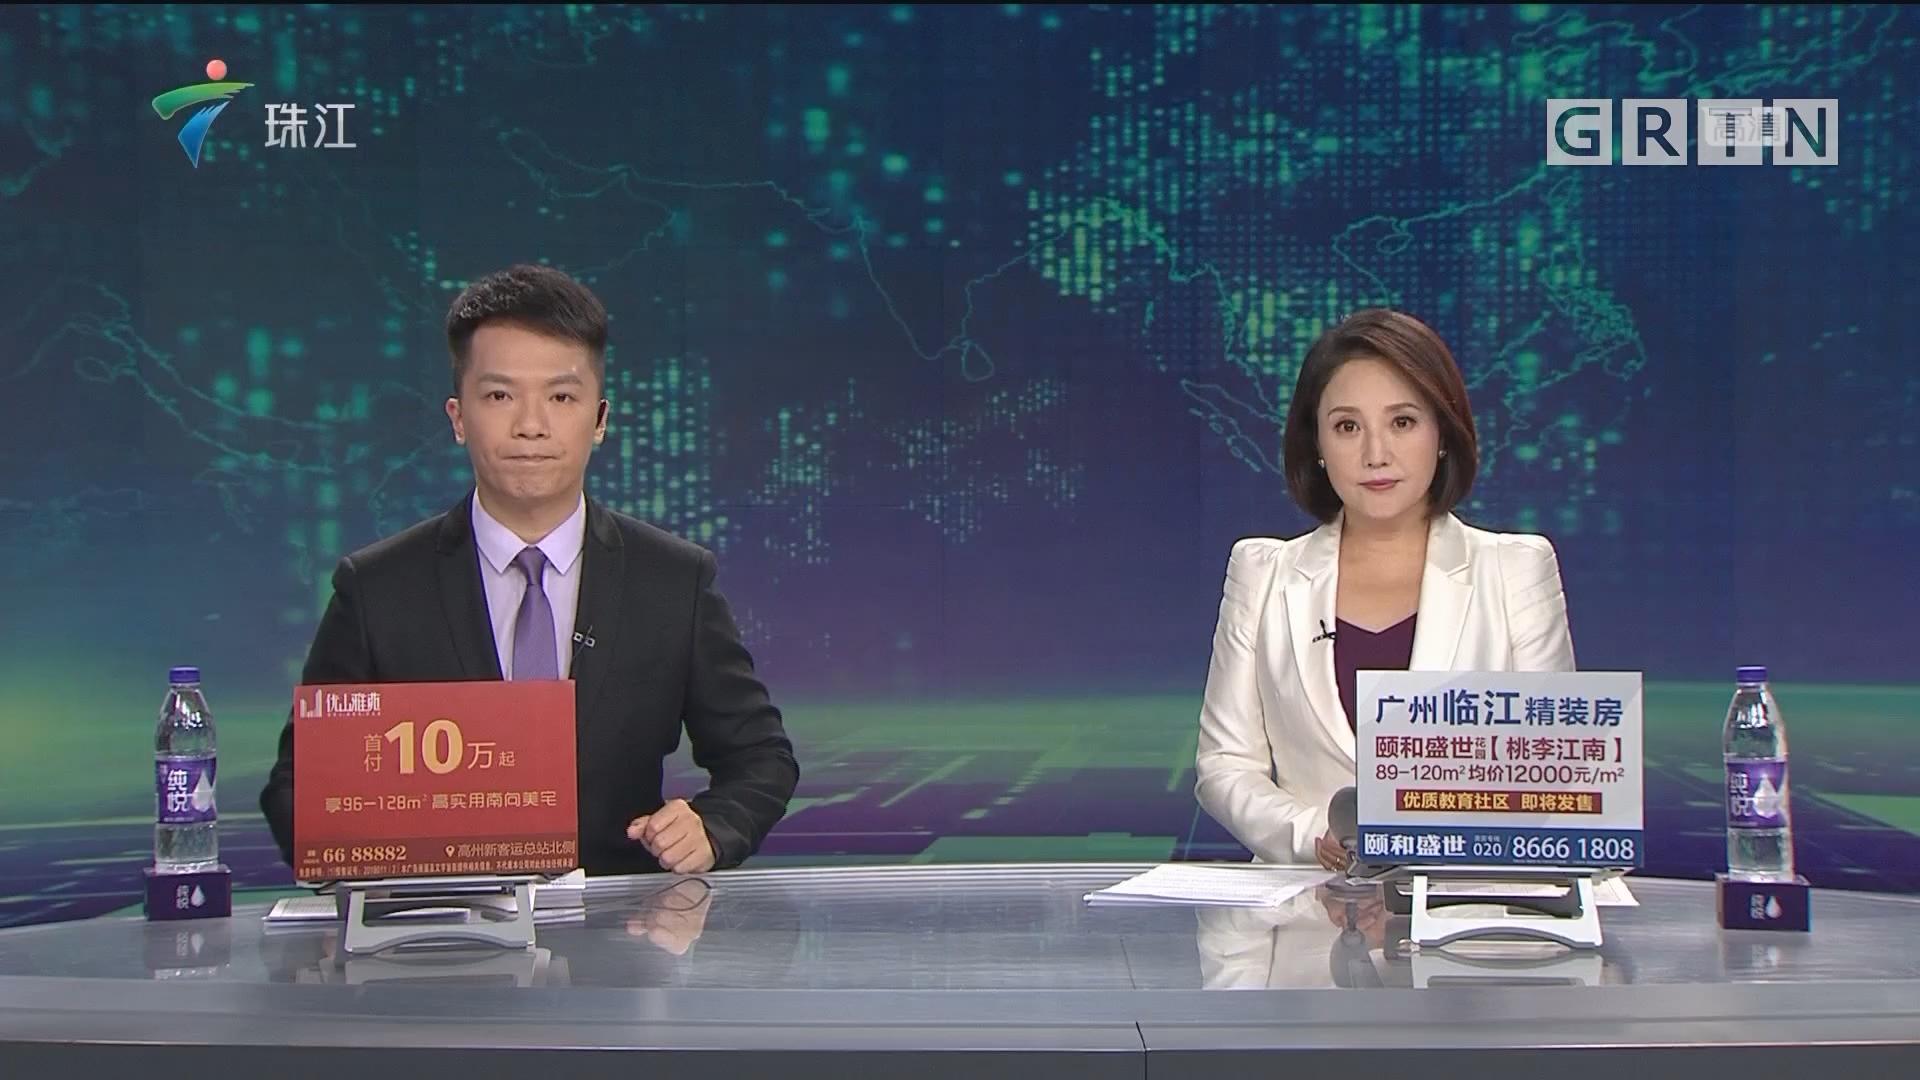 [HD][2019-10-17]珠江新闻眼:广东逾92%相对贫困人口实现脱贫